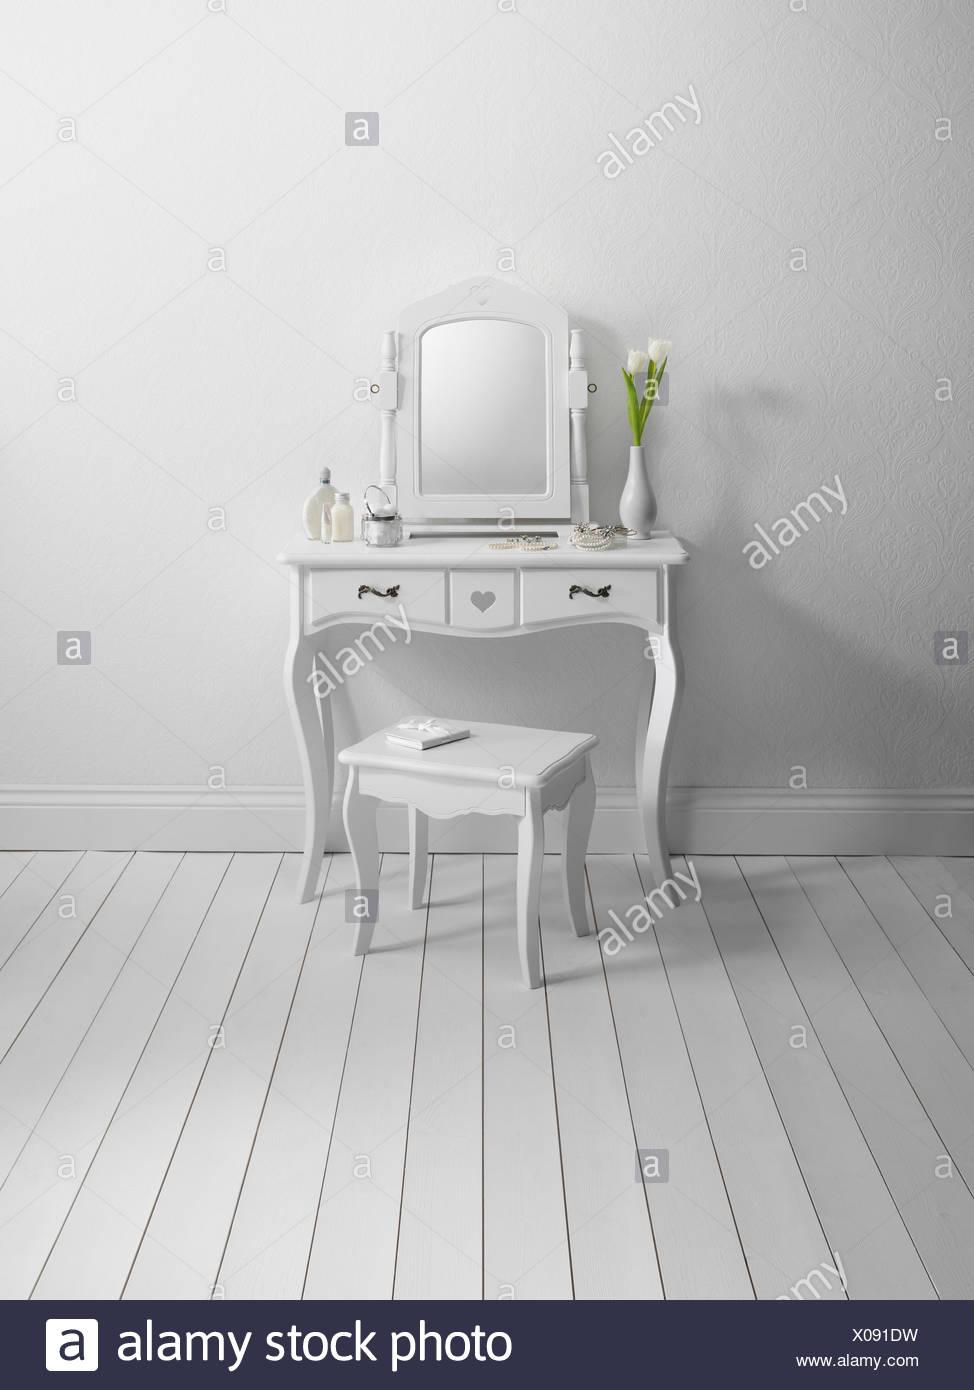 Dresser and stool in minimalist room - Stock Image